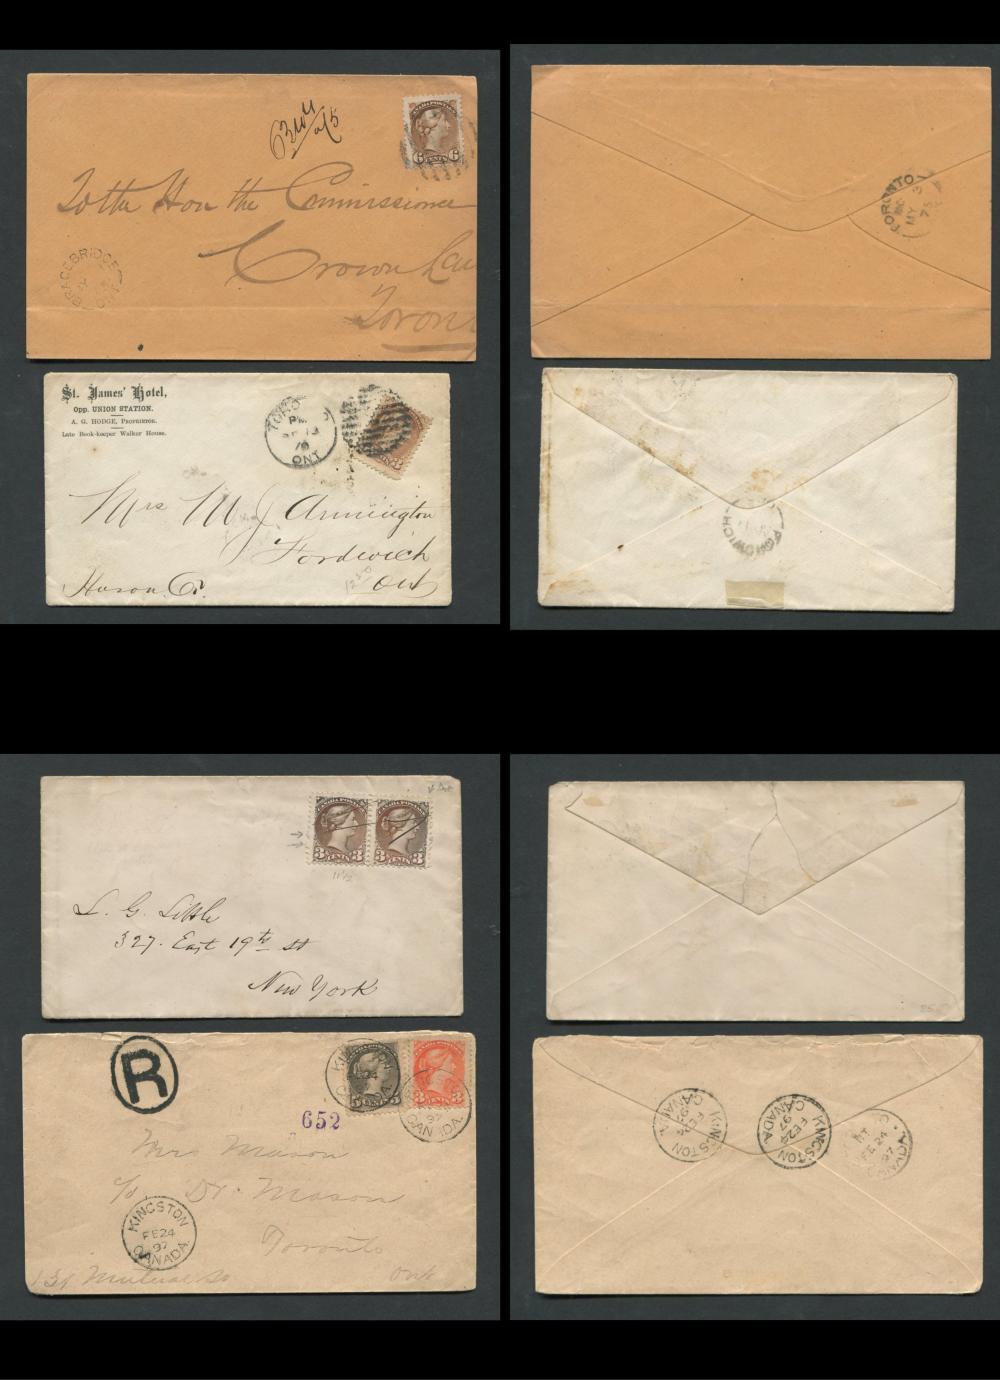 Canada Victoria Stamp Covers 4